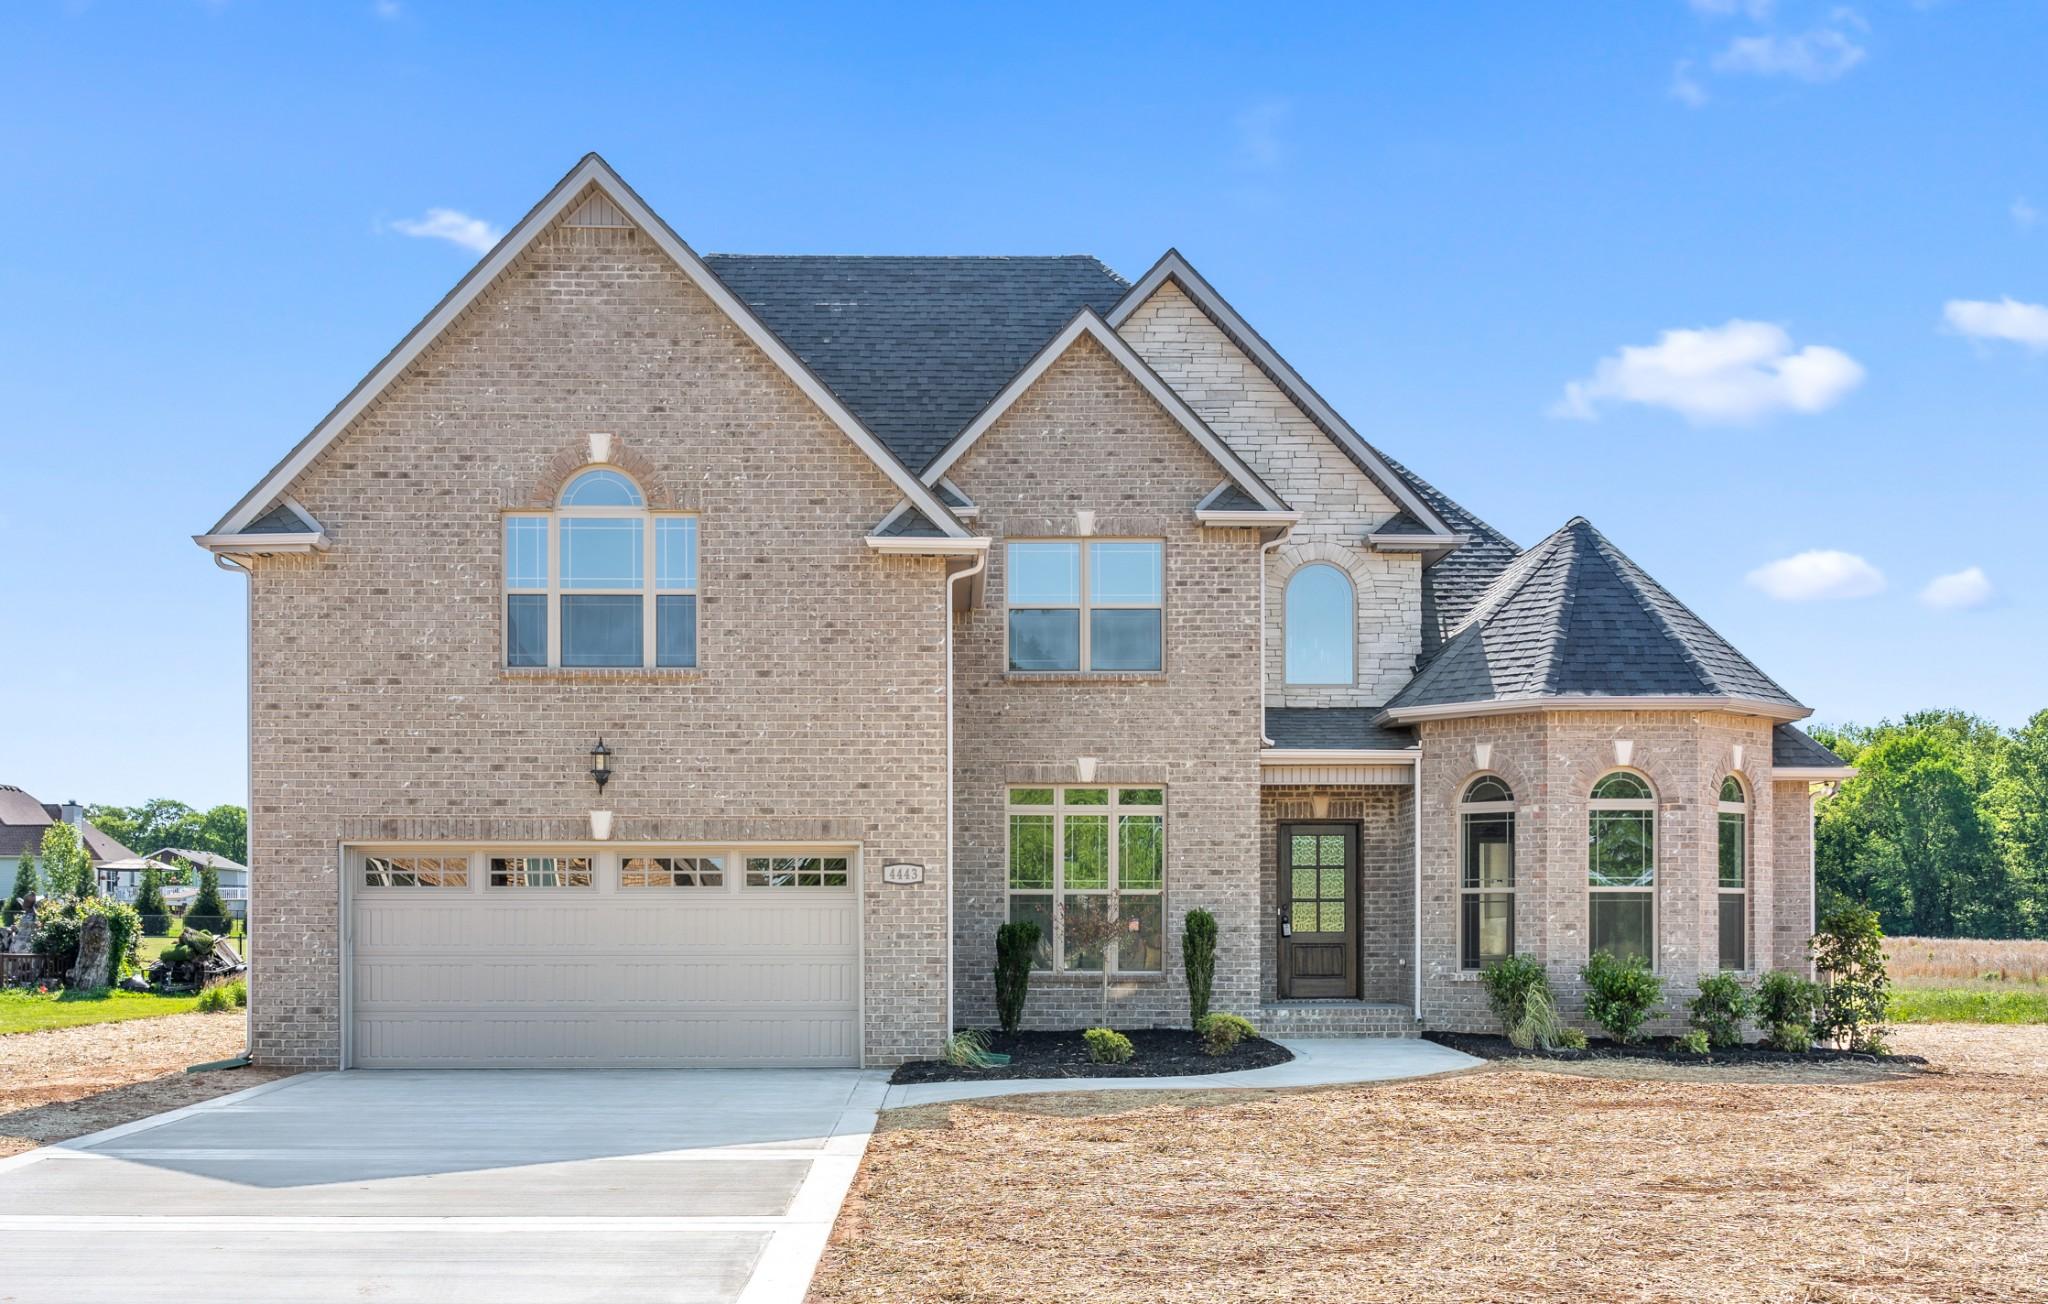 4443 Hickory Wild Ct, Clarksville, TN 37040 - Clarksville, TN real estate listing